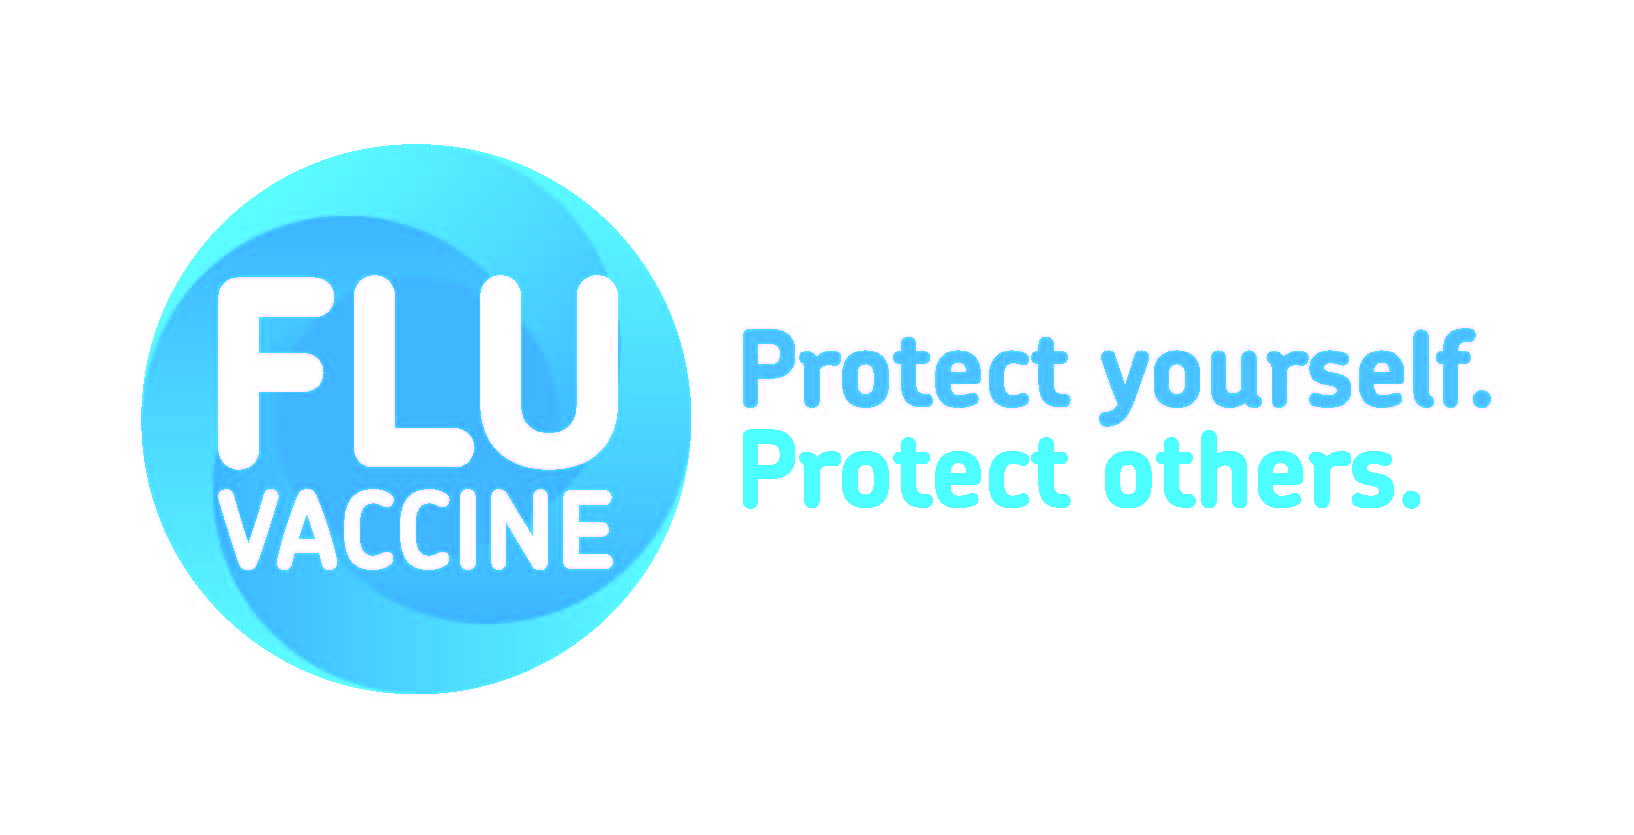 Flu Vaccine 2020 – Information for Staff